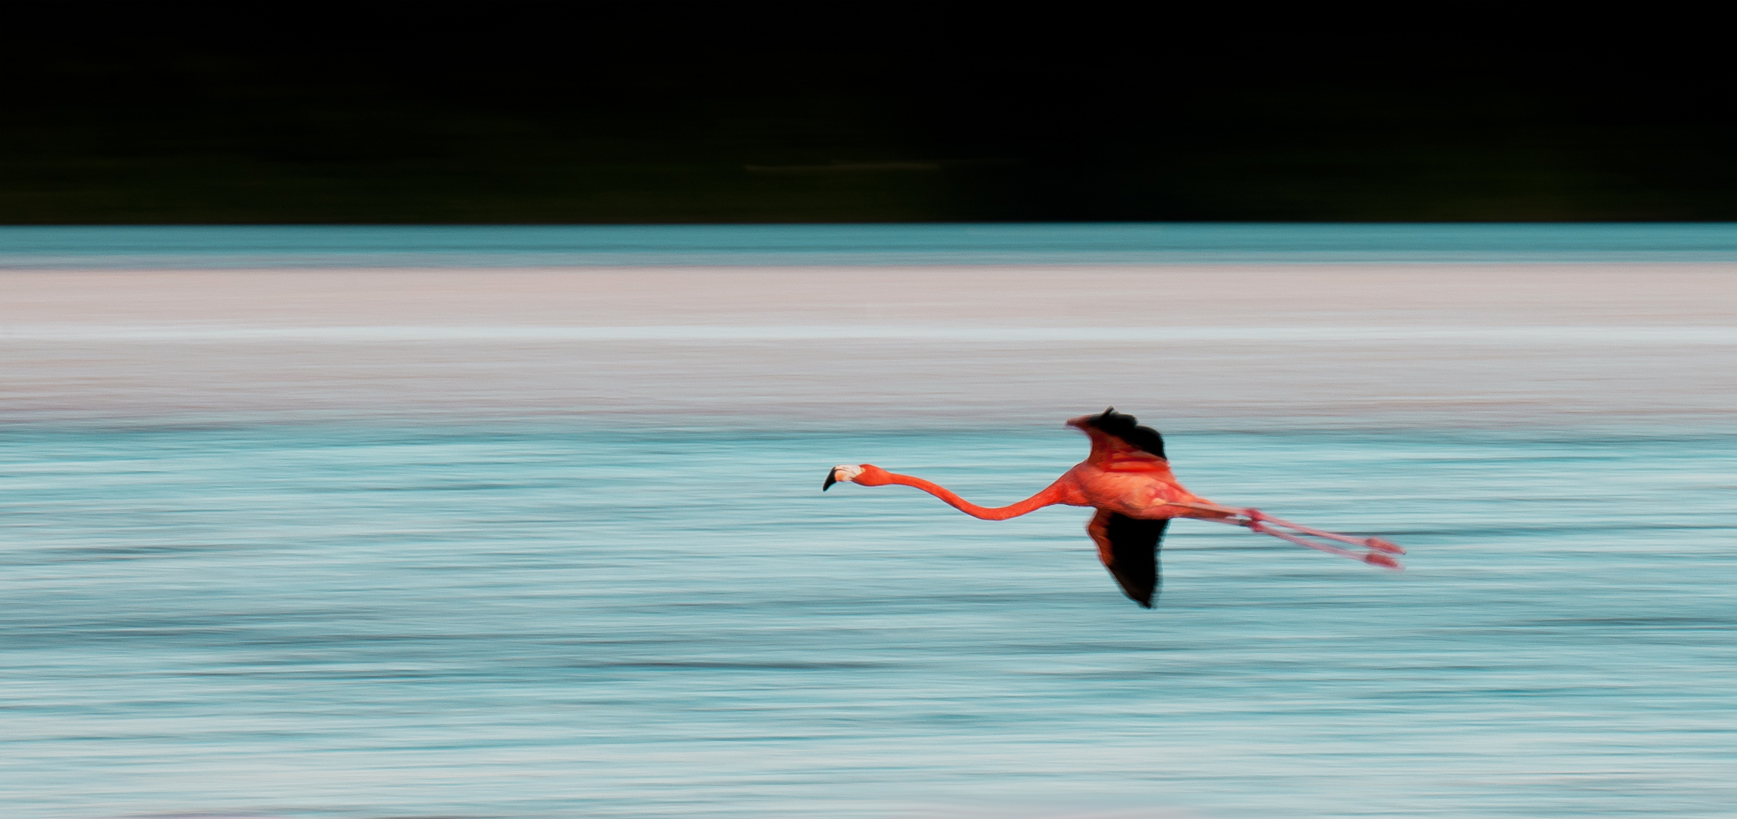 Alejandro Prieto Photography